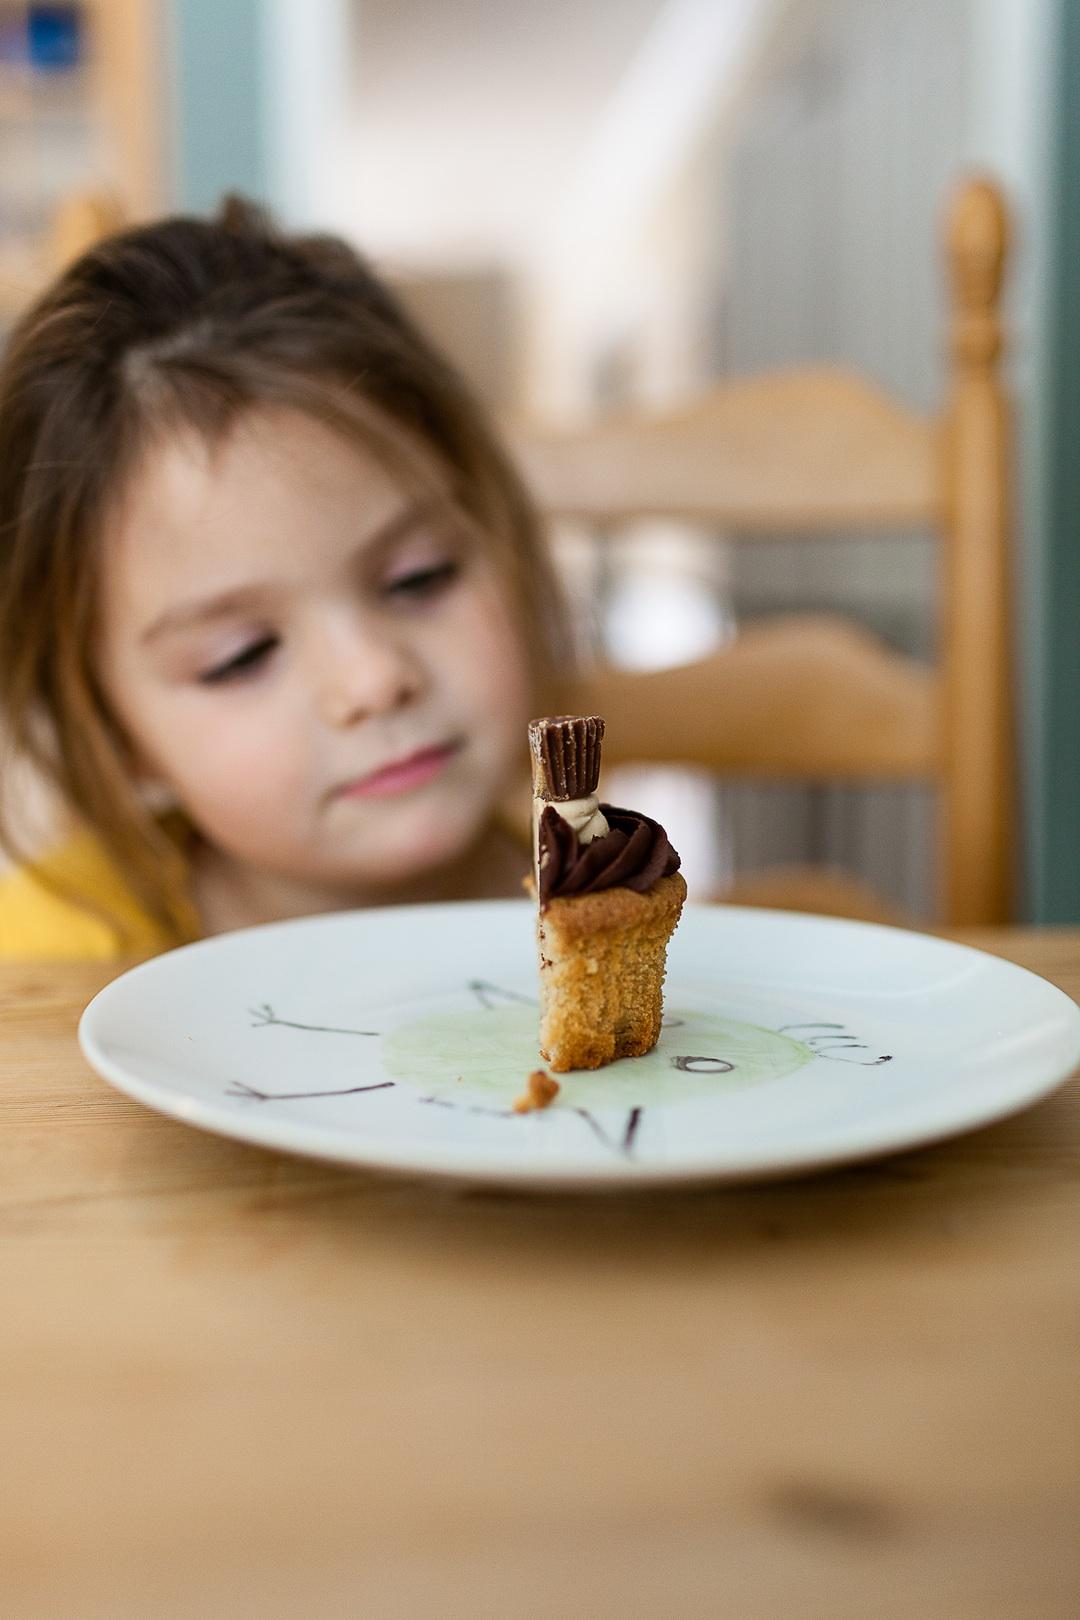 nina mirando medio pastel